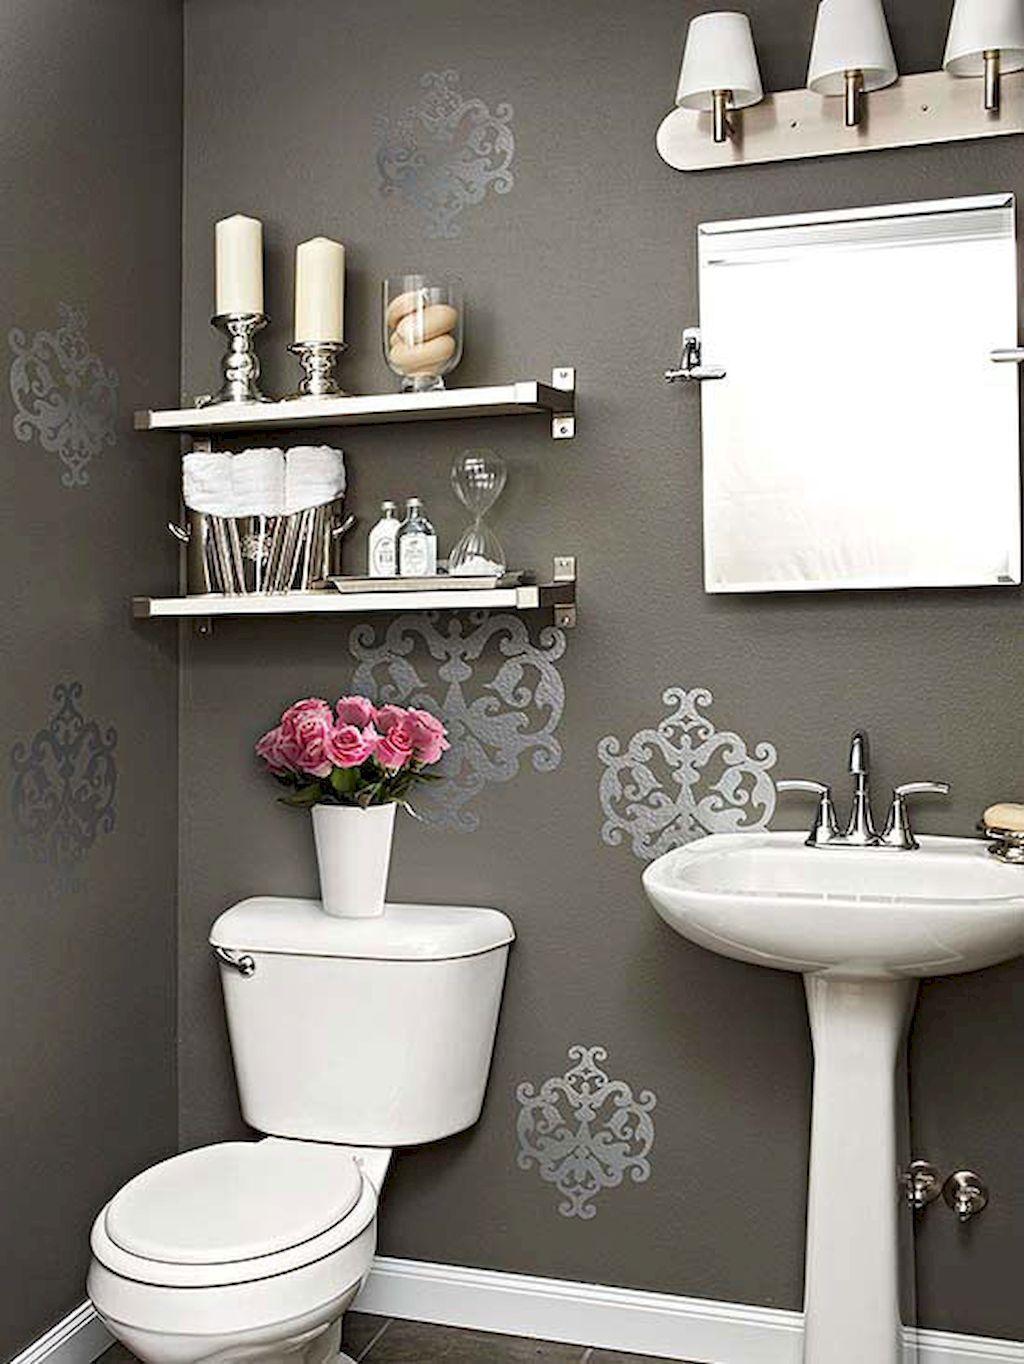 80 Small Powder Room Decorating Ideas